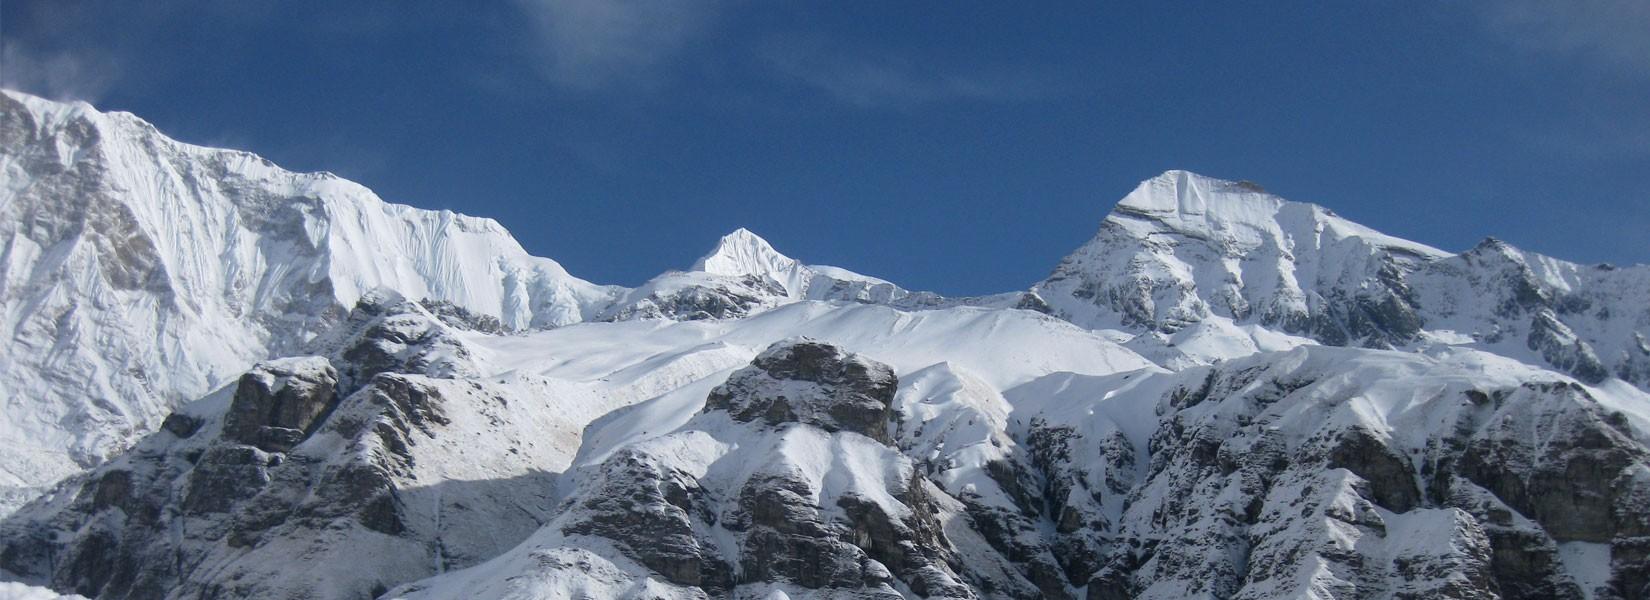 Annapurna Base Camp Elevation